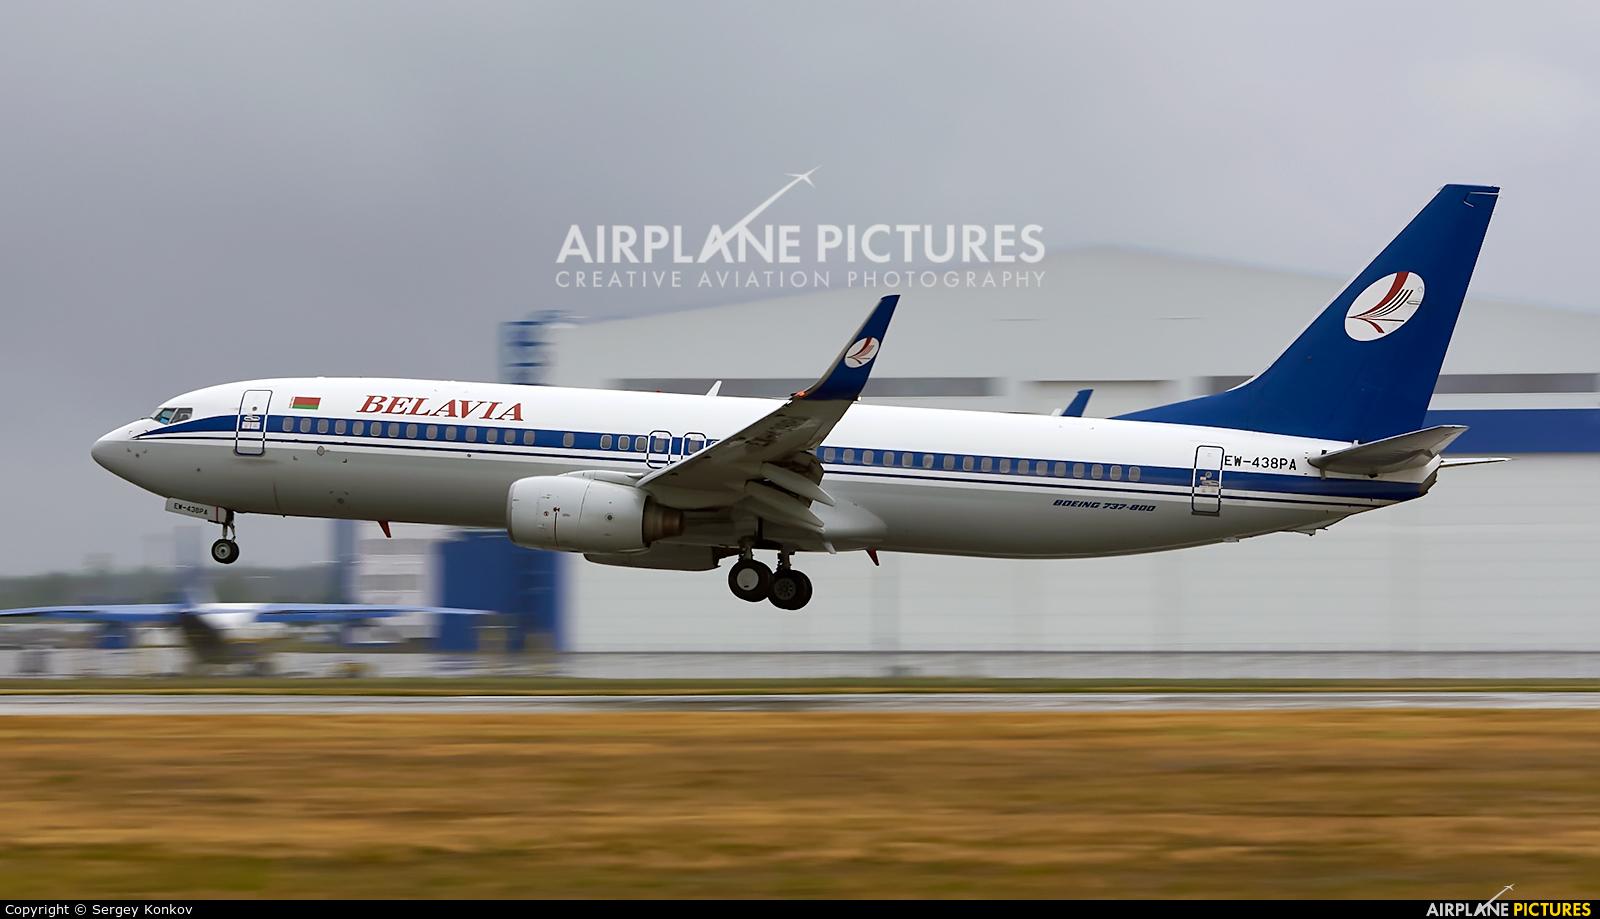 Belavia EW-438PA aircraft at Minsk Intl